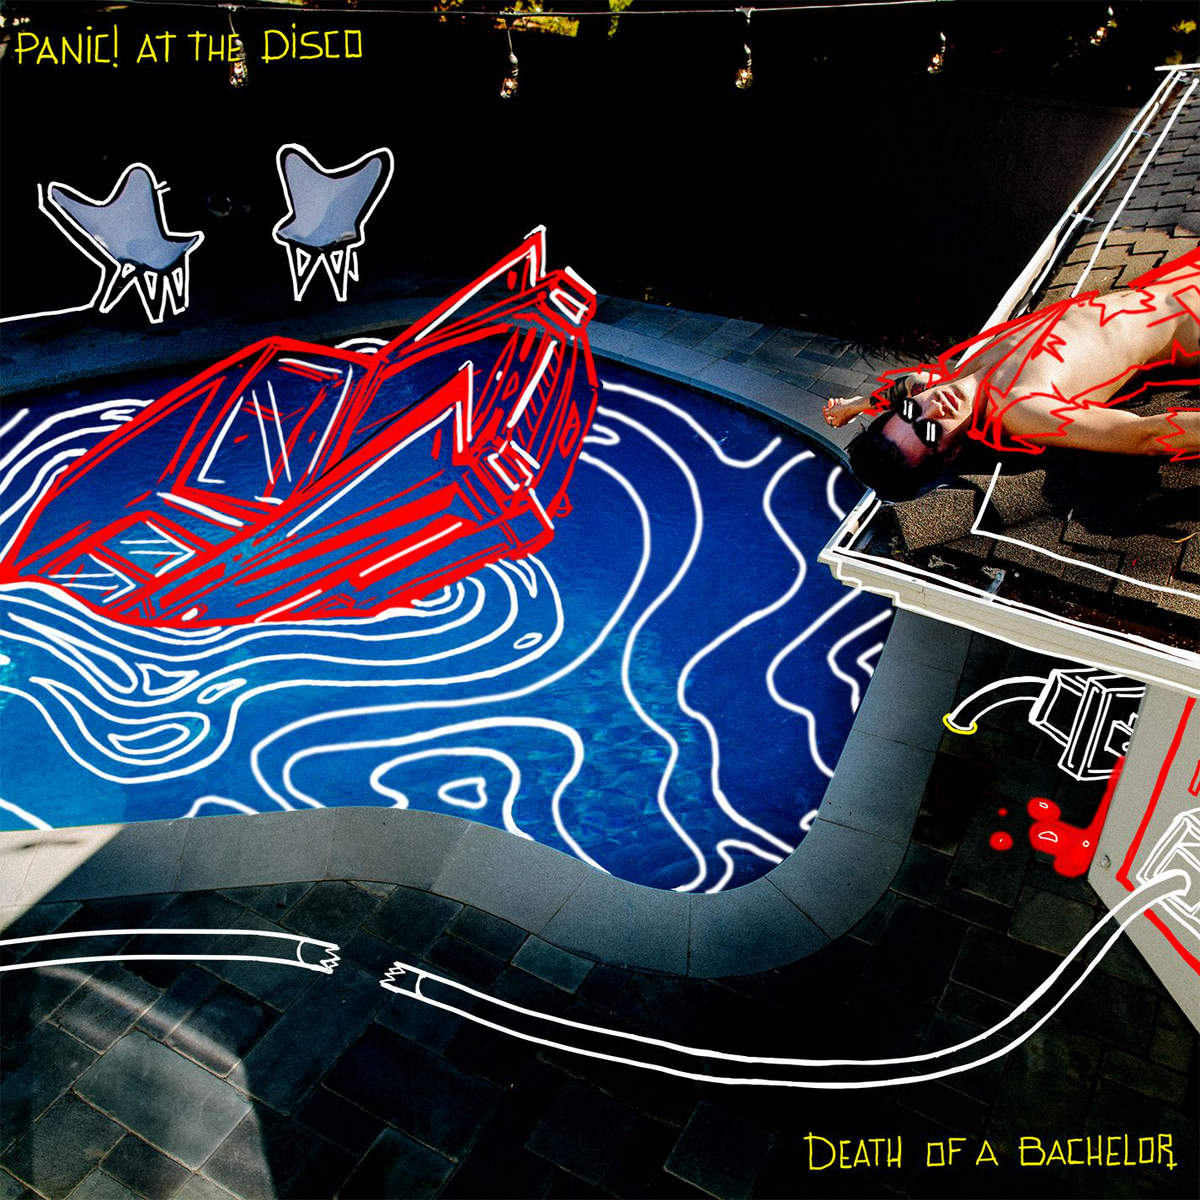 panic-at-the-disco-death-bachelor-album